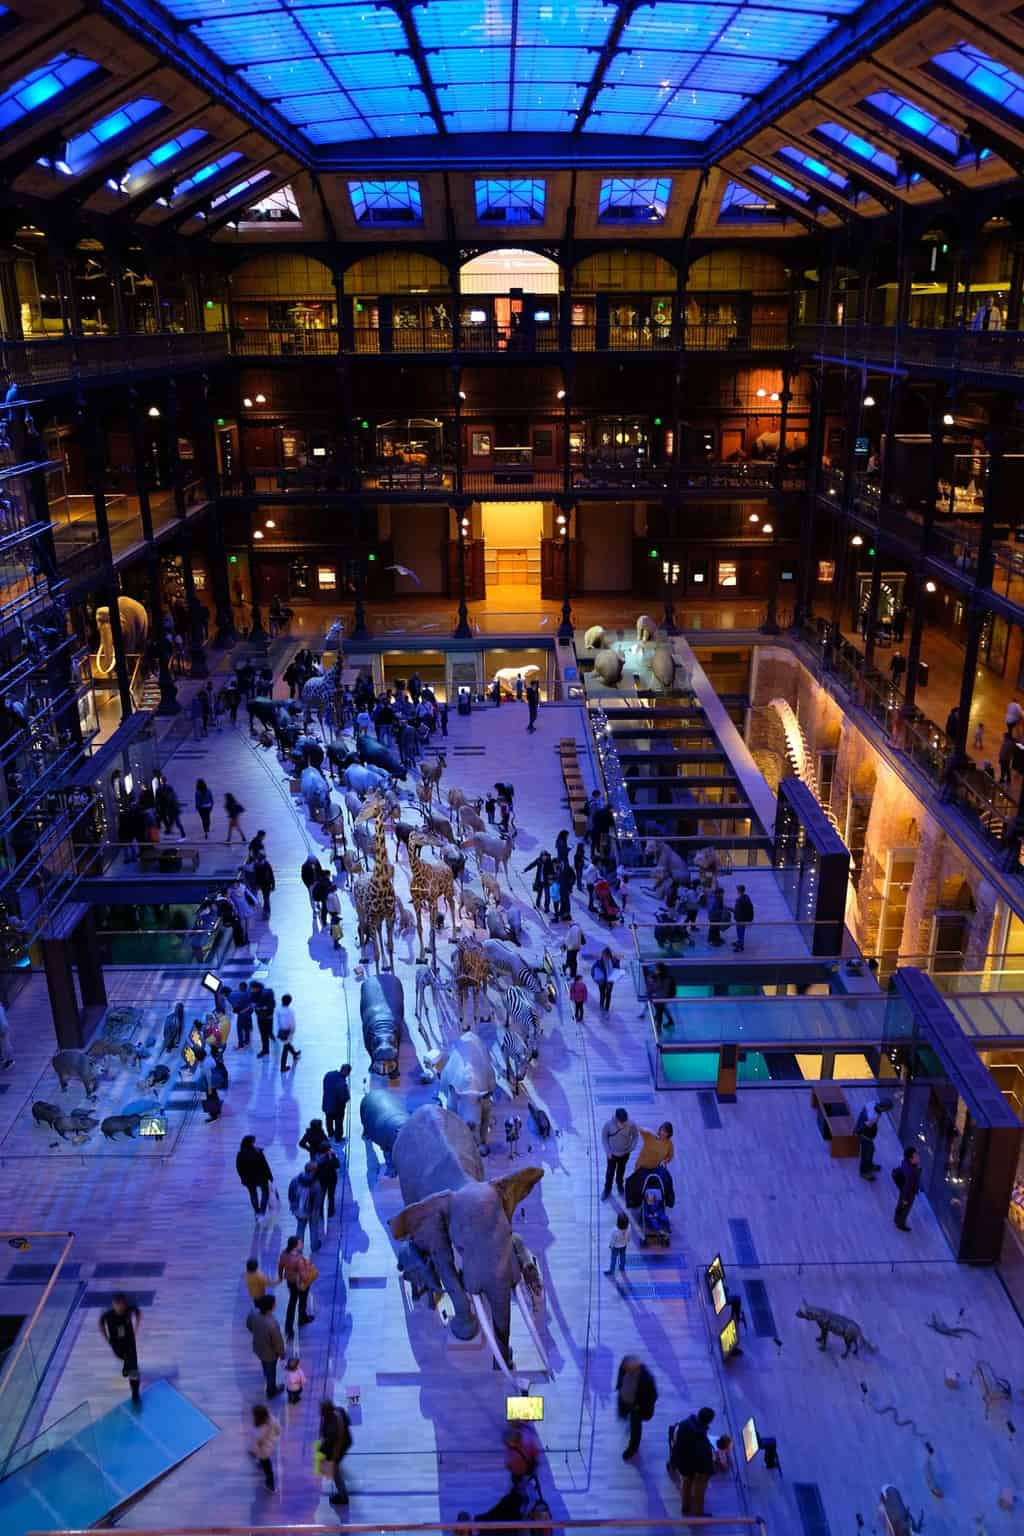 Grande Galerie de l'Evalution